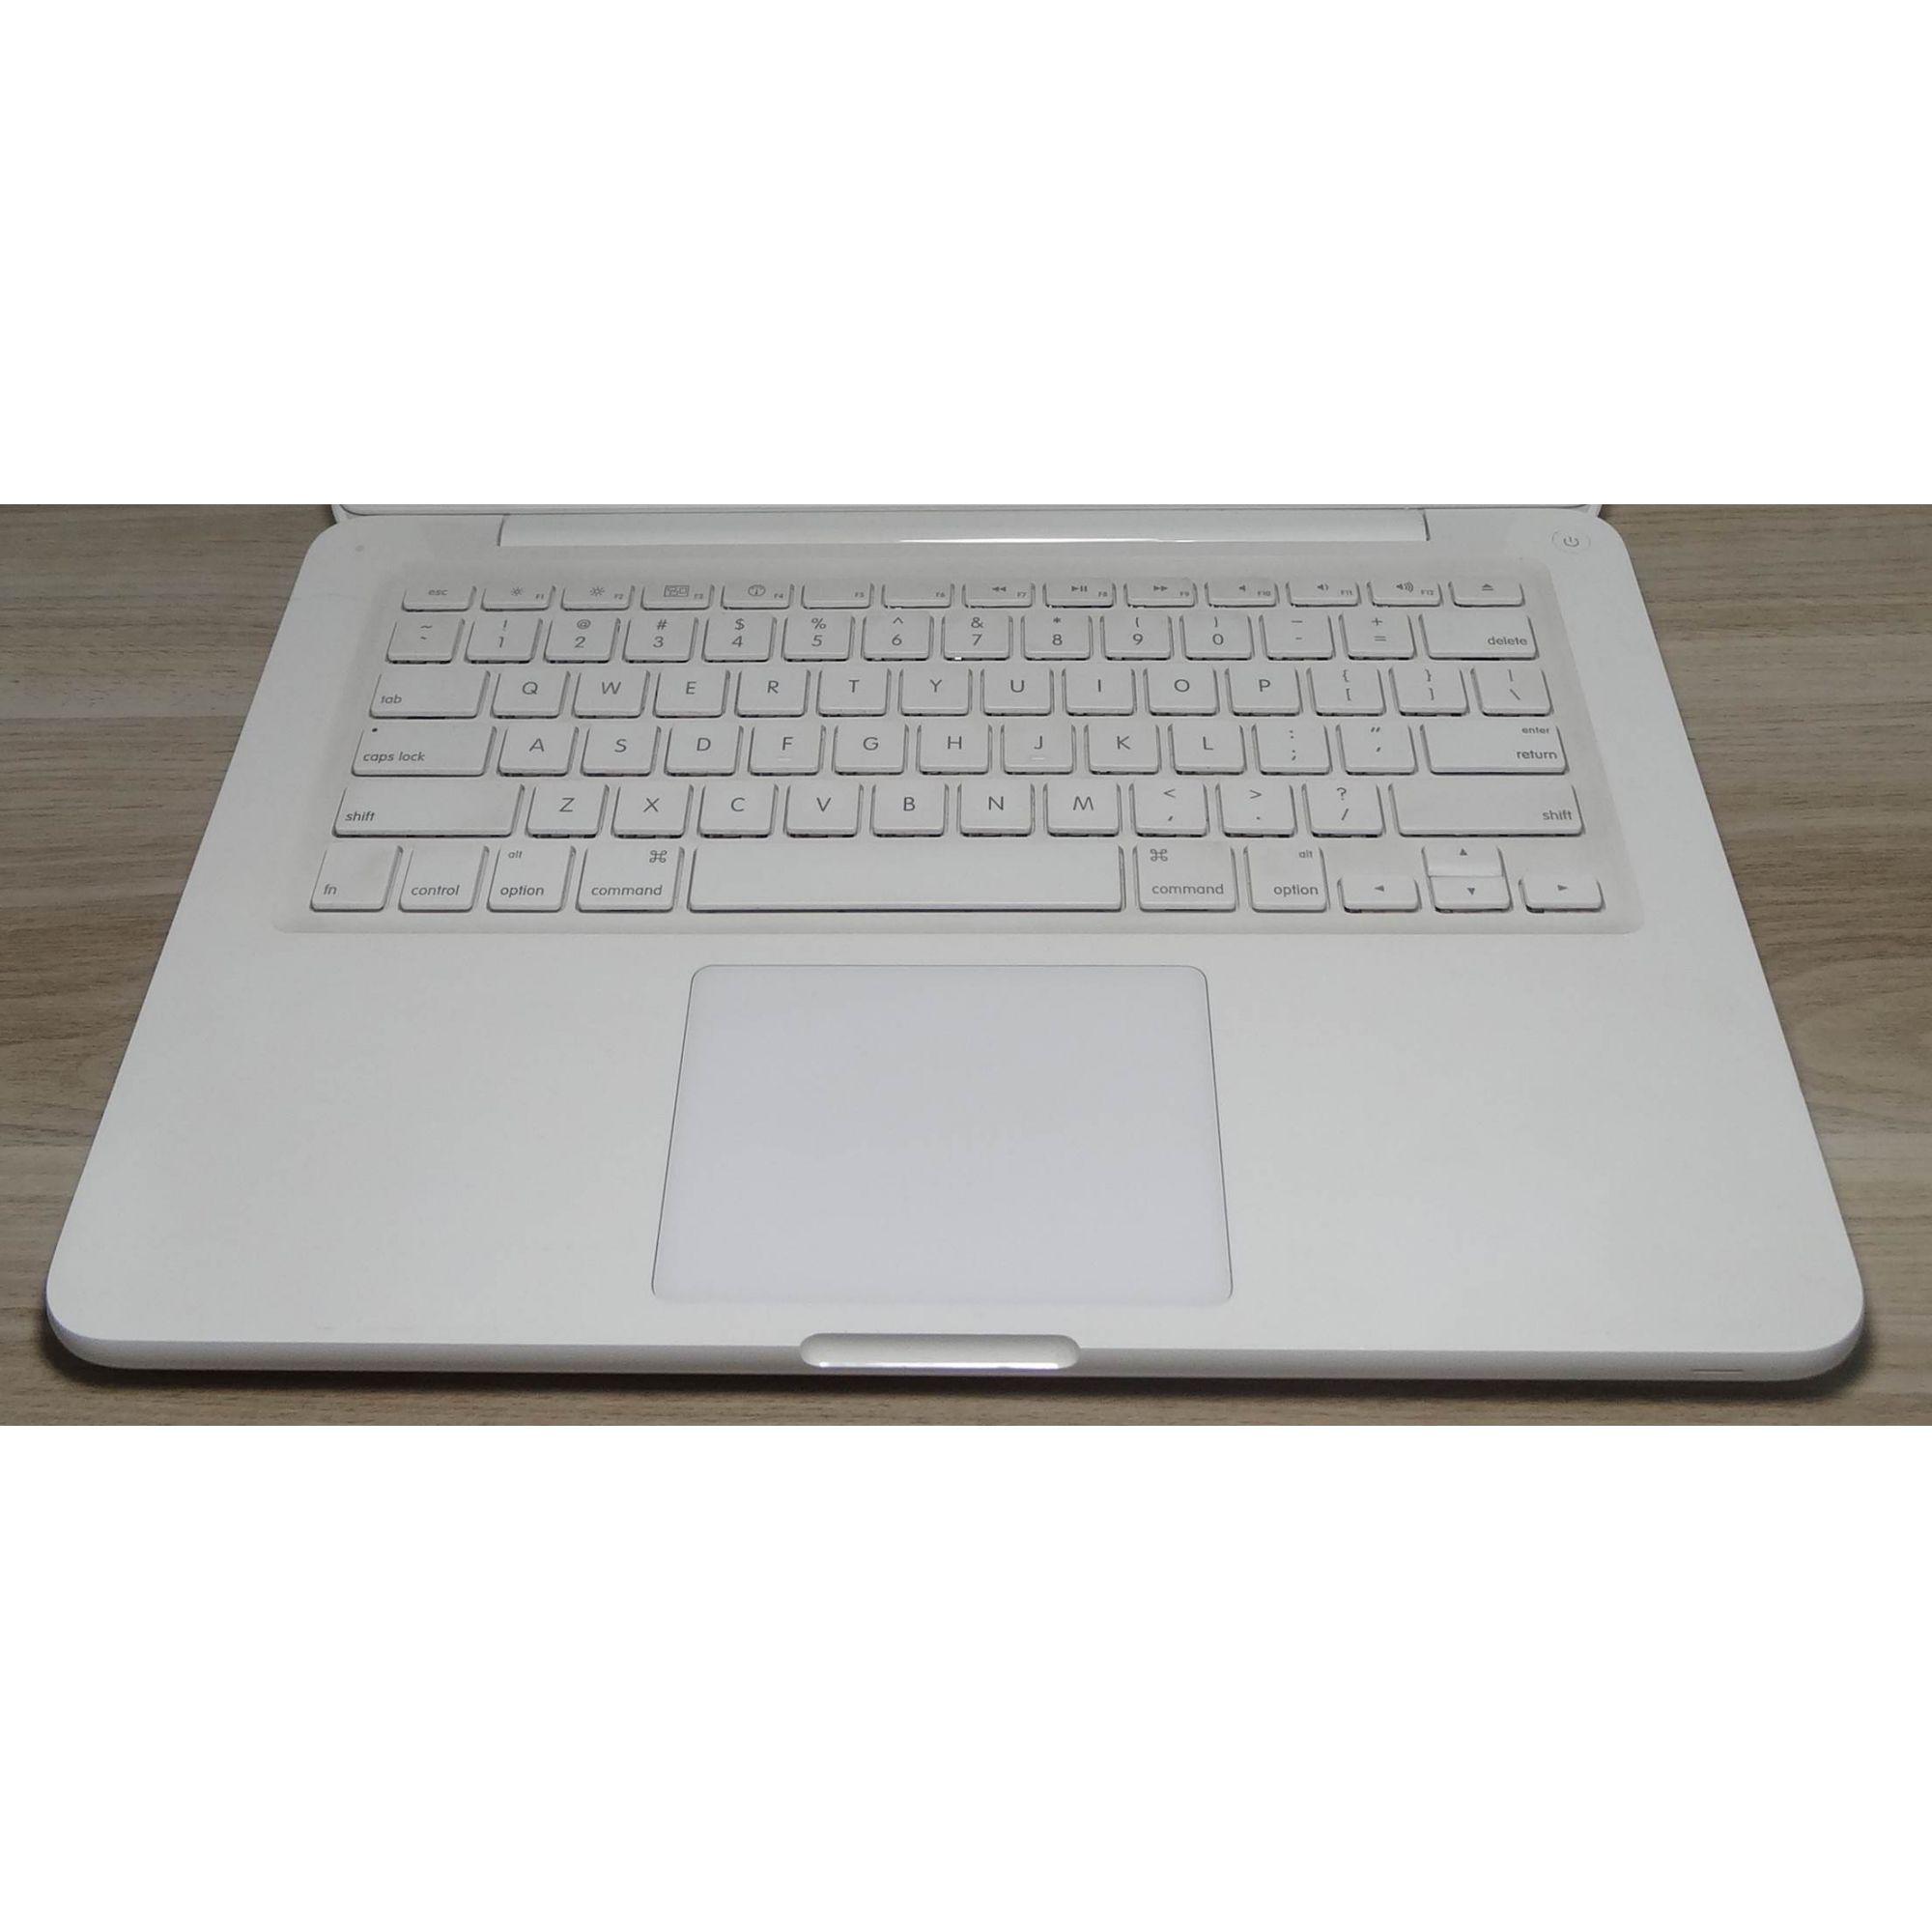 "MacBook White MC516LL/A 13.3"" Intel Core 2 Duo 2.4GHz 4GB 250GB HD (Não Enviamos)"